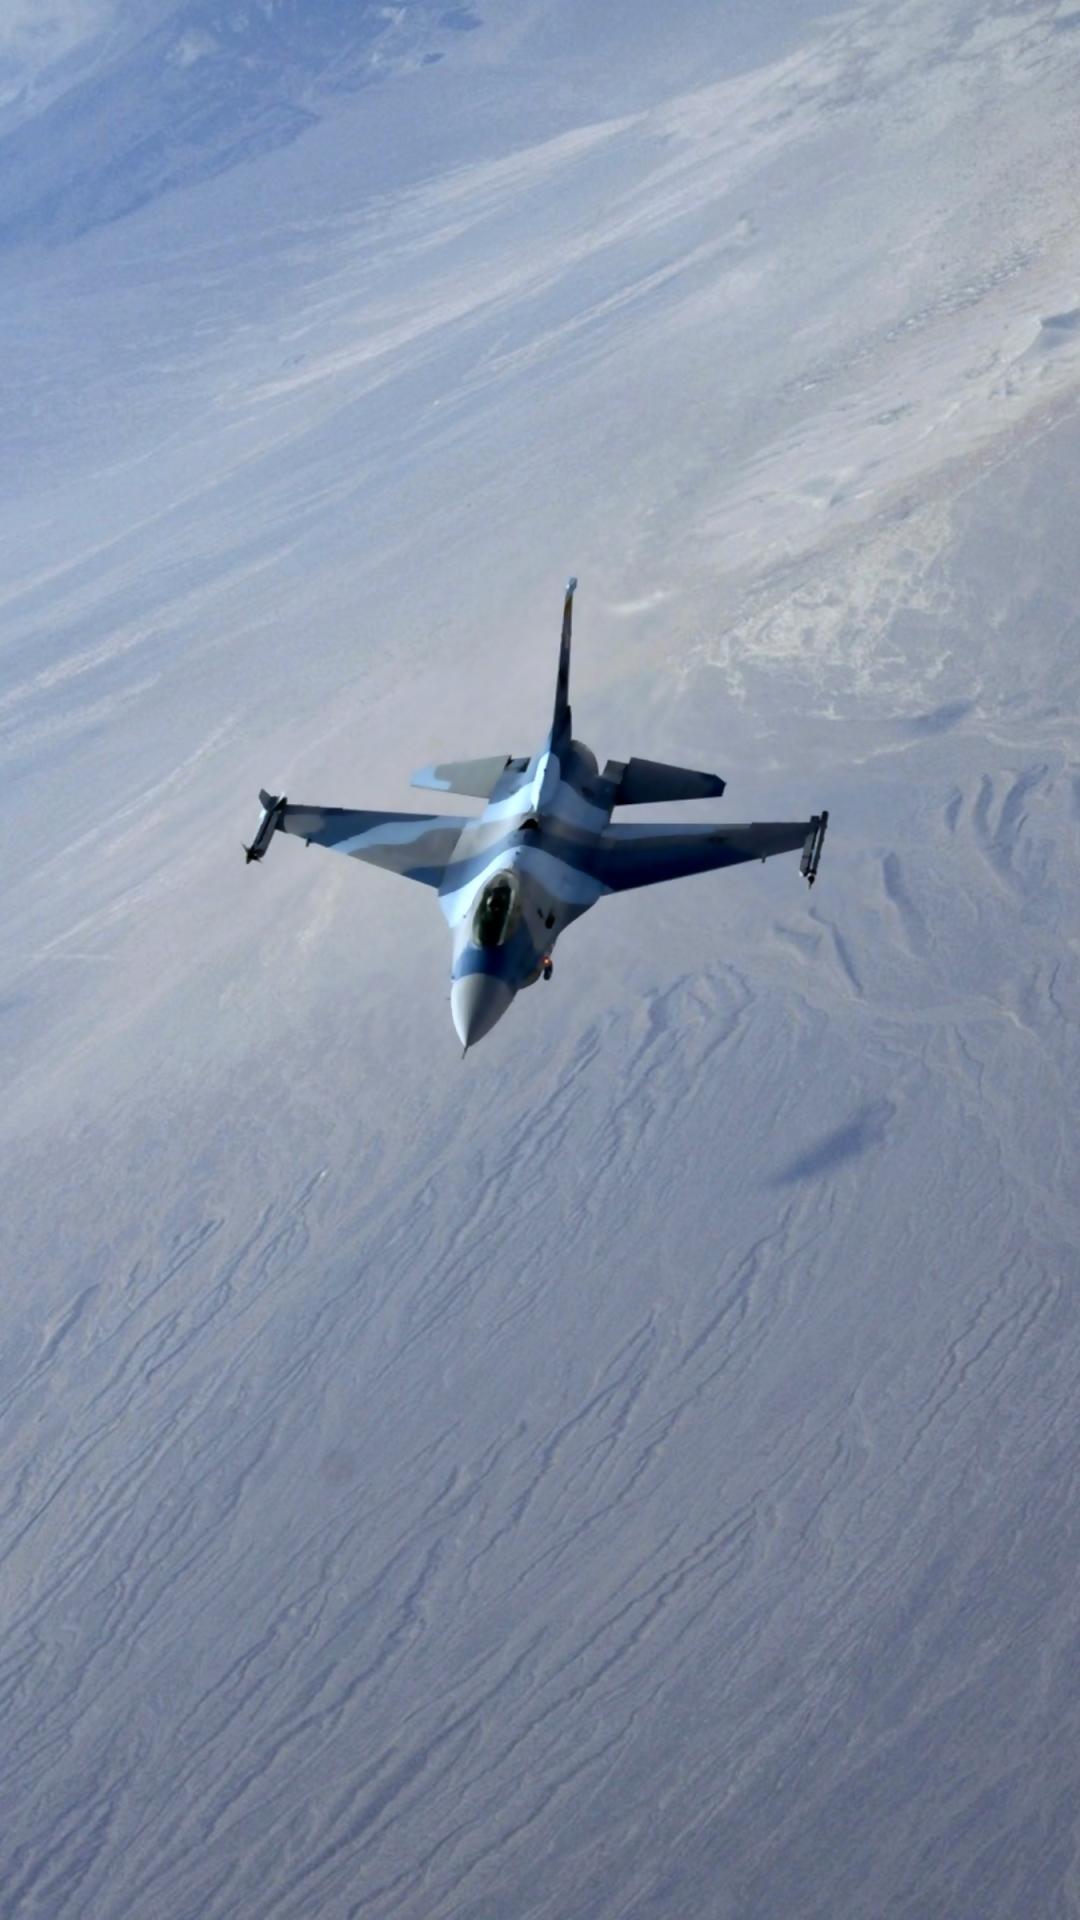 1080x1920 - military/jet fighter - wallpaper id: 662121